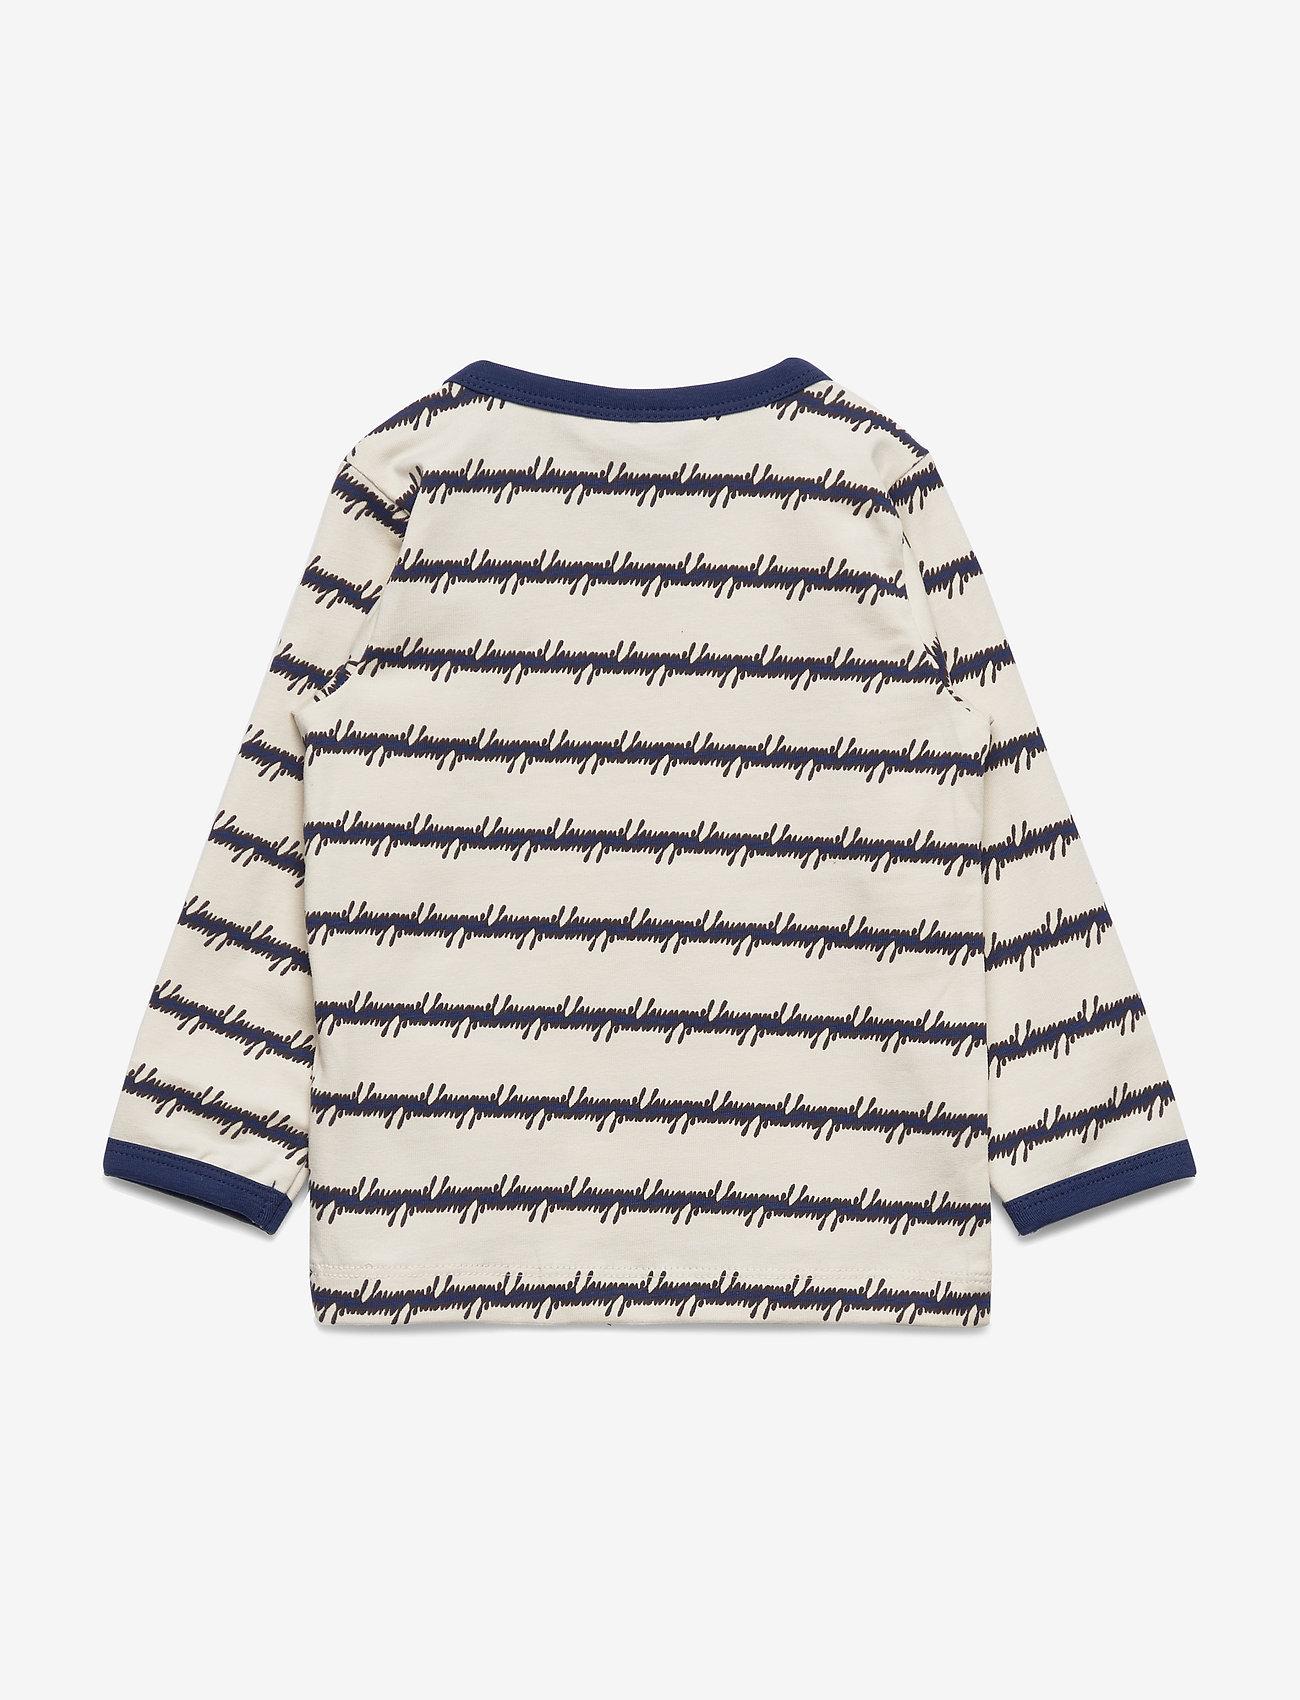 Hummel - hmlKEREM T-SHIRT L/S - long-sleeved t-shirts - turtledove - 1